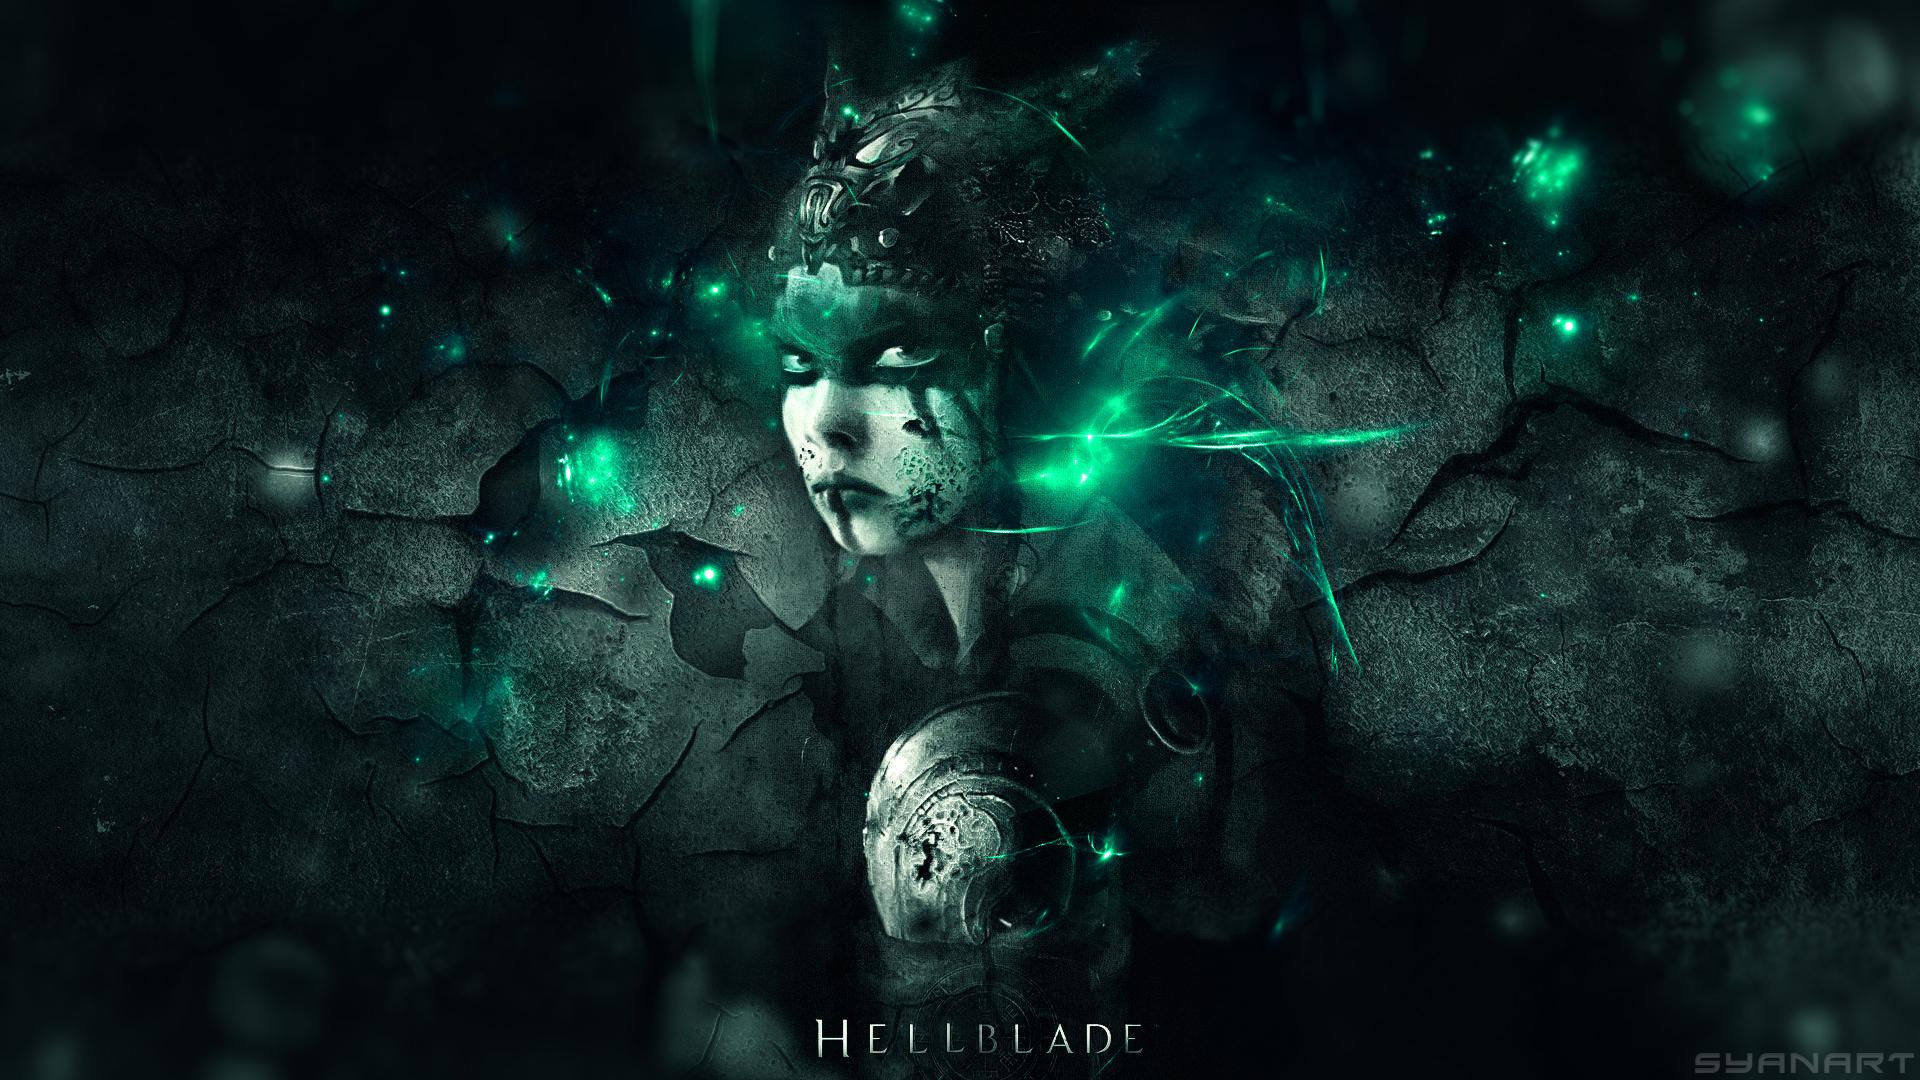 Injustice 2 Wallpaper Hd Photo Hellblade Senuas Sacrifice